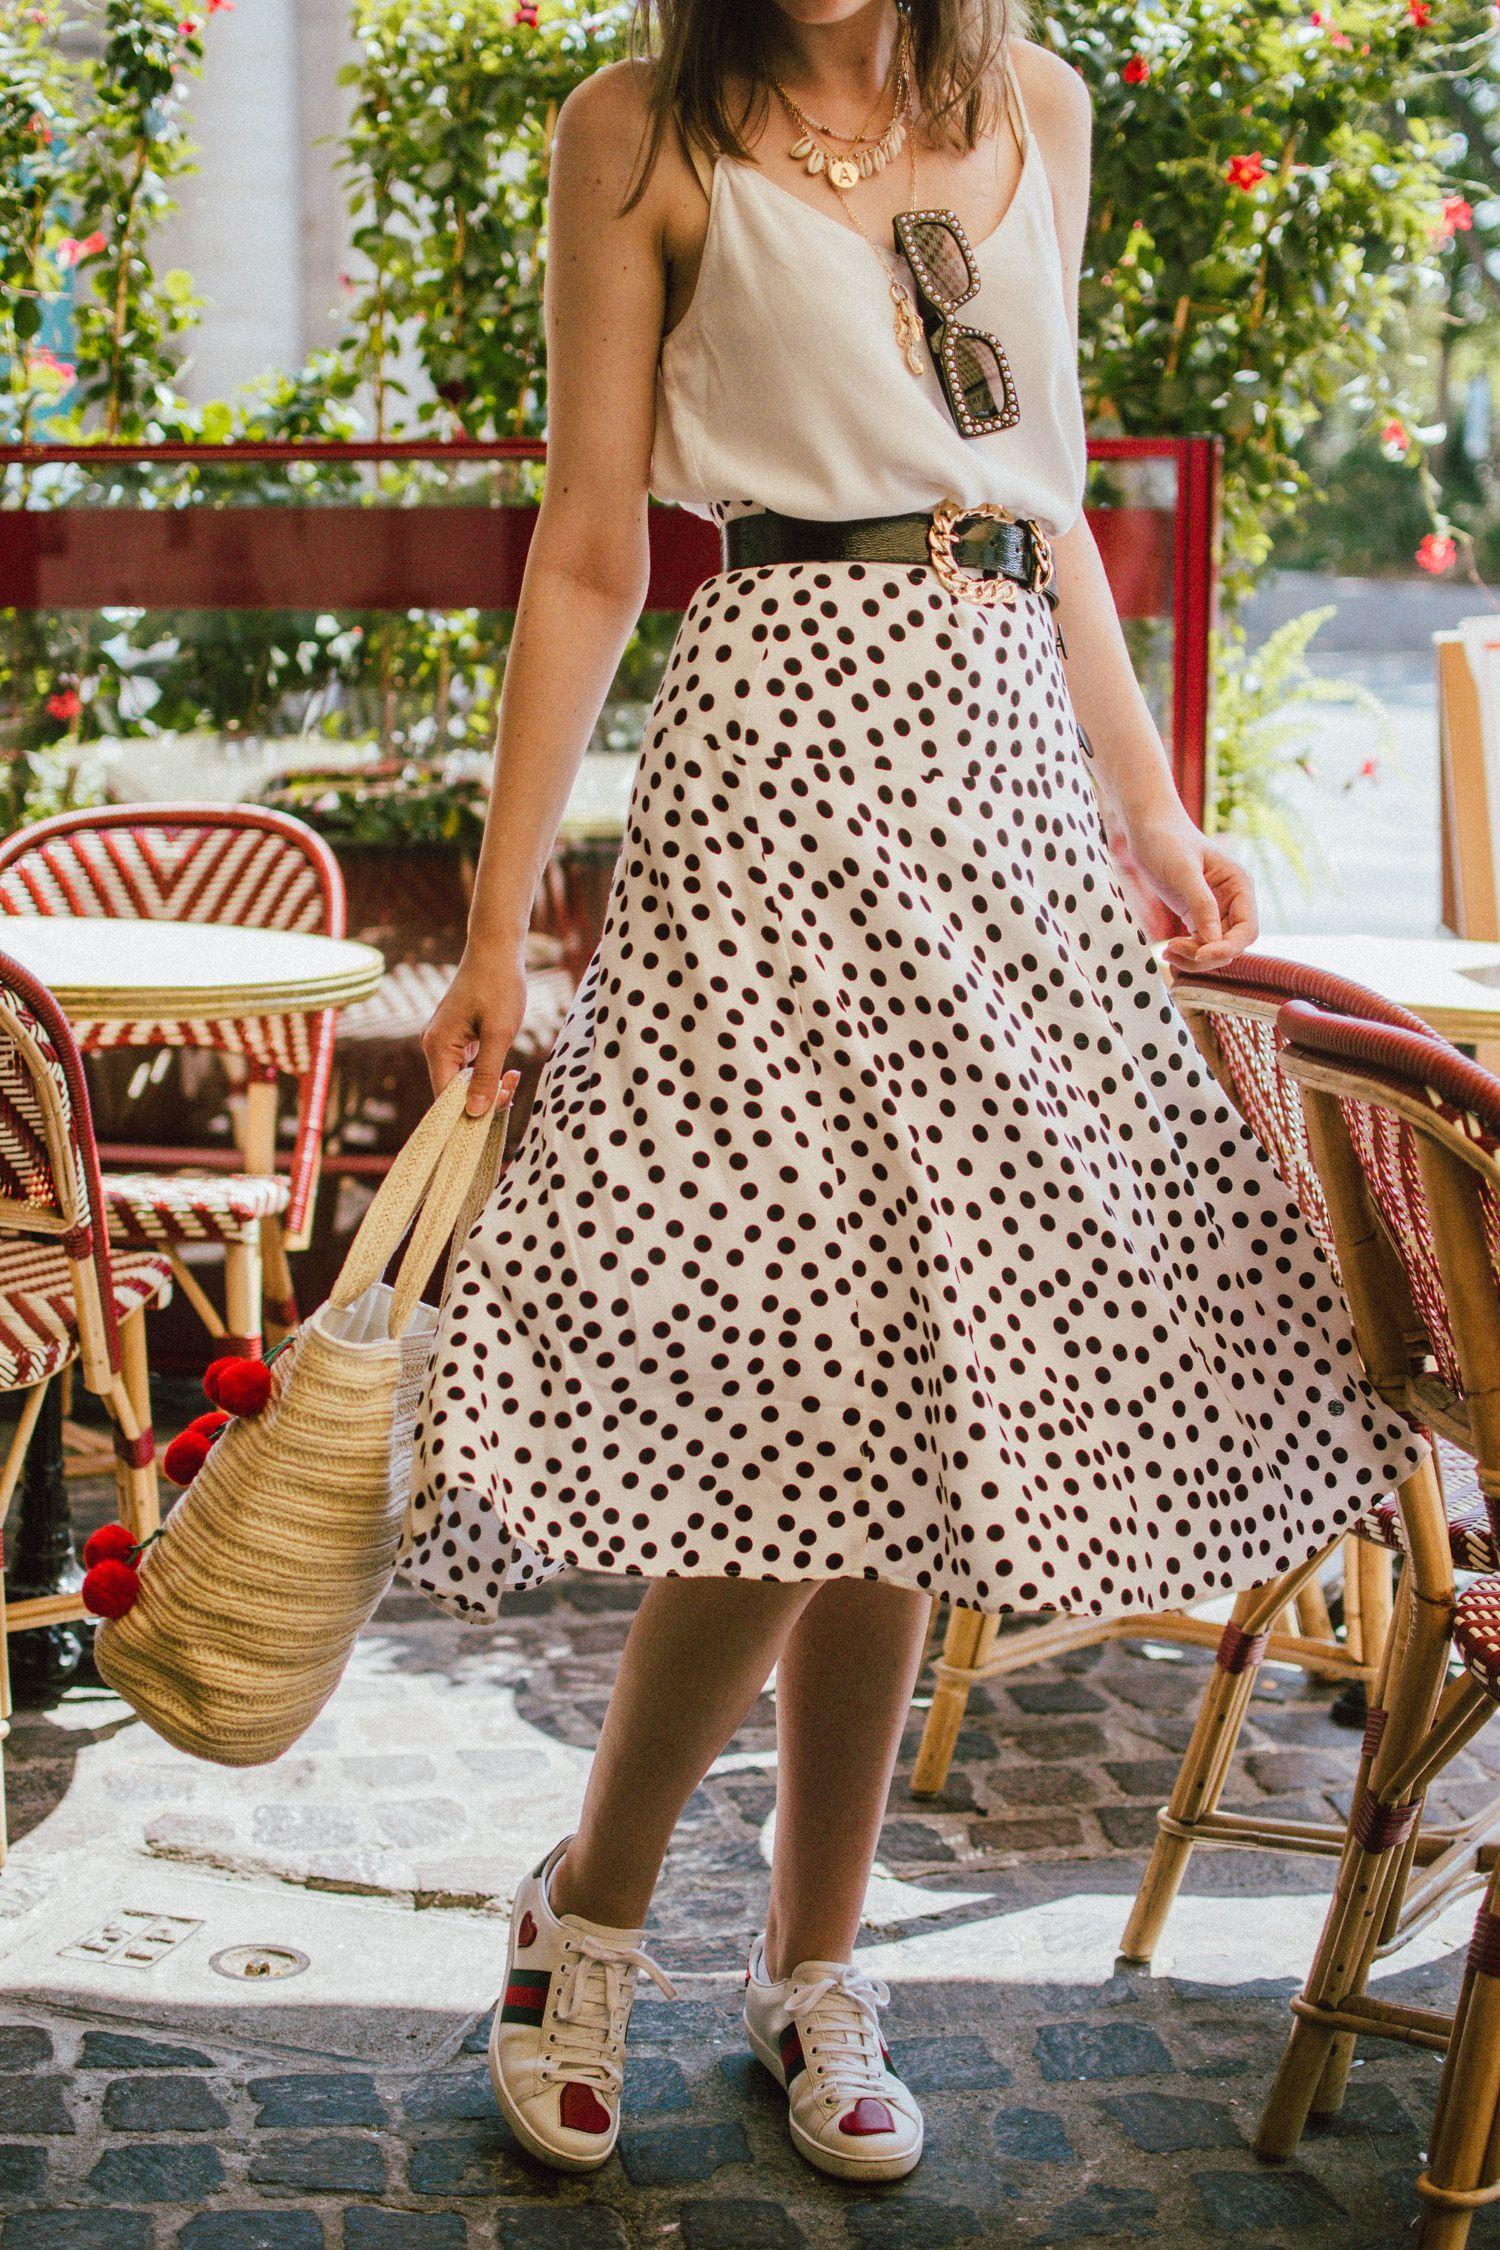 4687c0896e Zara polka dot skirt, white cami top, gucci ace heart sneakers, cherry pom  pom straw summer bag, paris, andreea birsan, couturezilla, cute summer  outfit ...